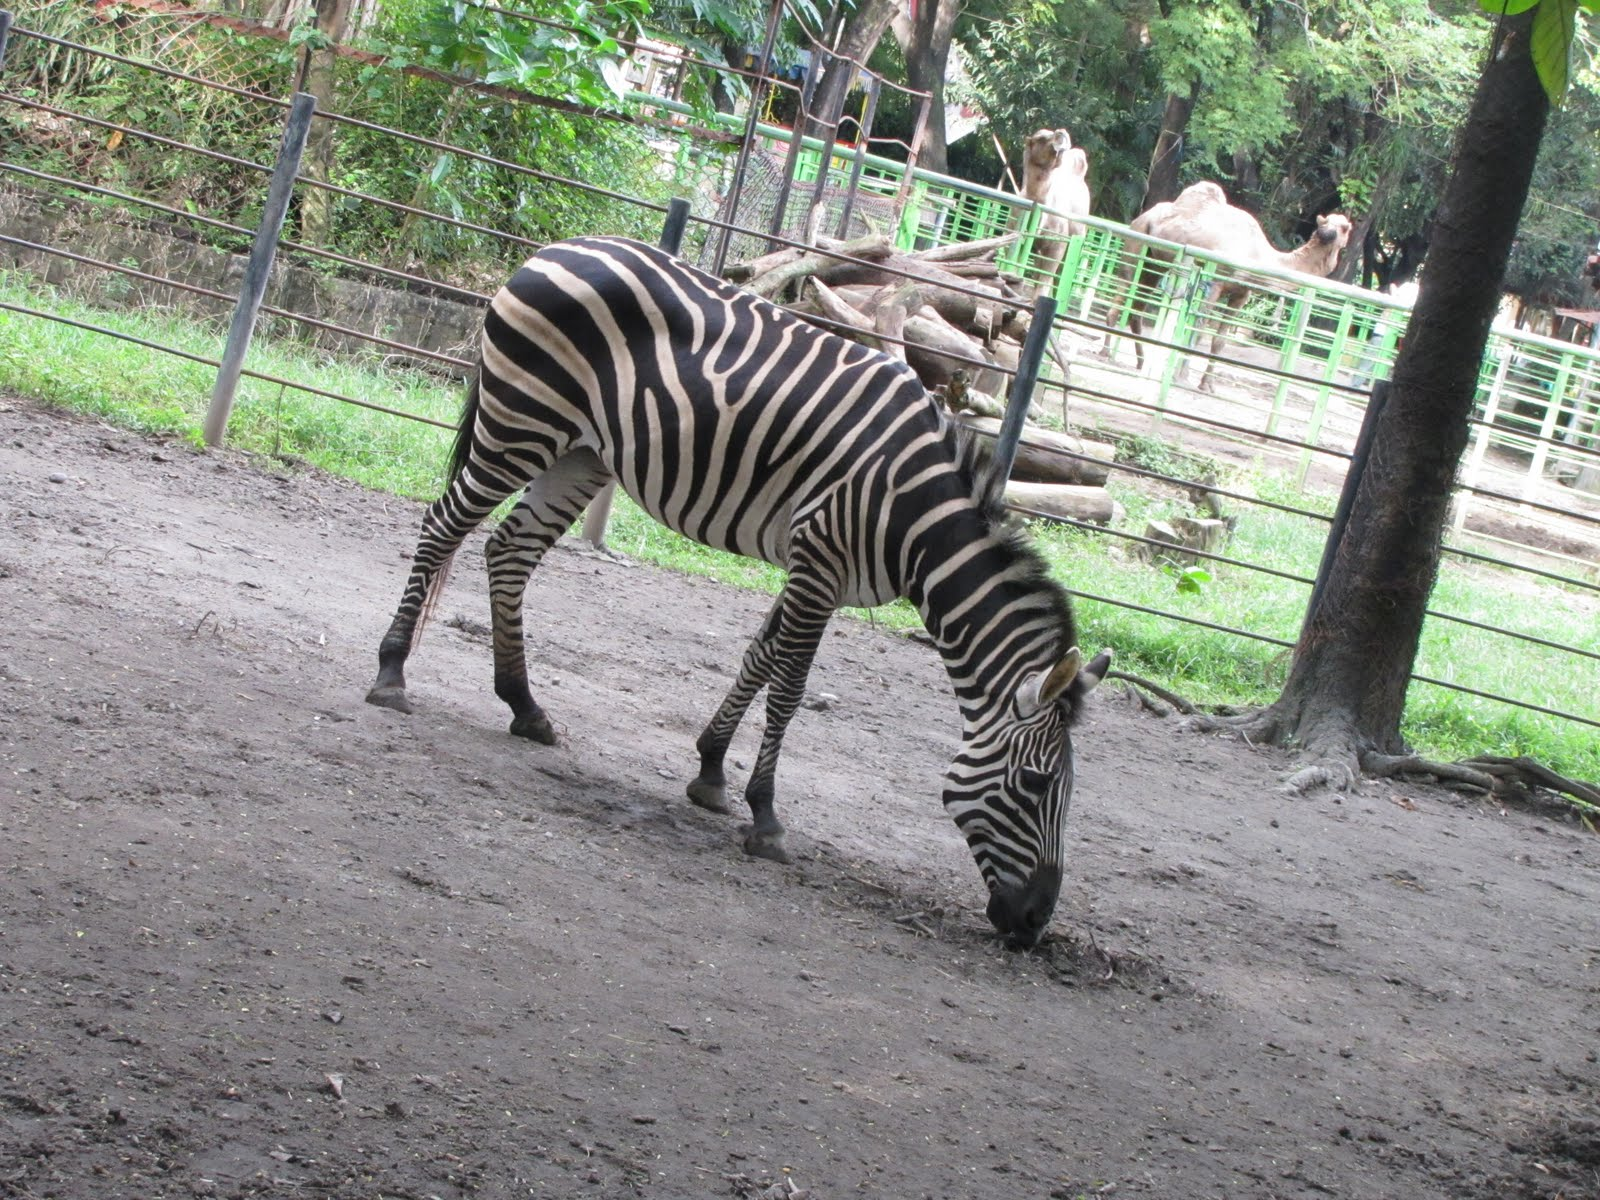 zebra a unique white and black stripes encyclopedia of animal. Black Bedroom Furniture Sets. Home Design Ideas